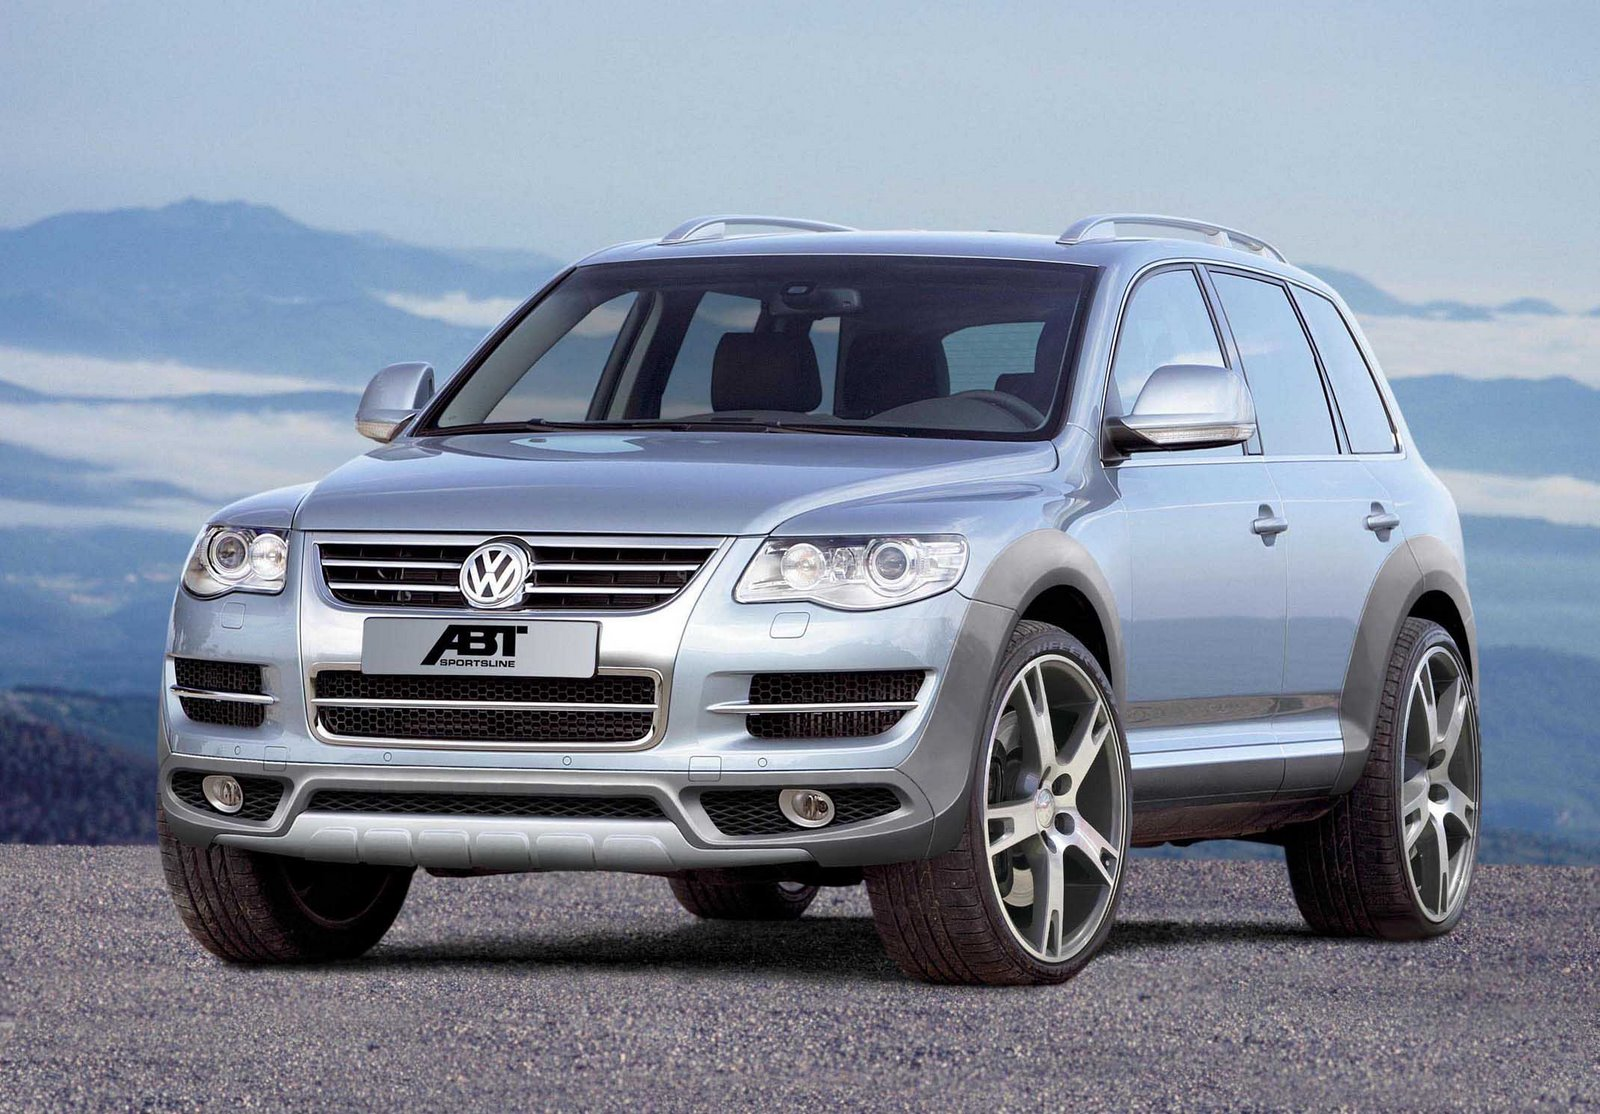 Luxury Suvs 7 Top Seater